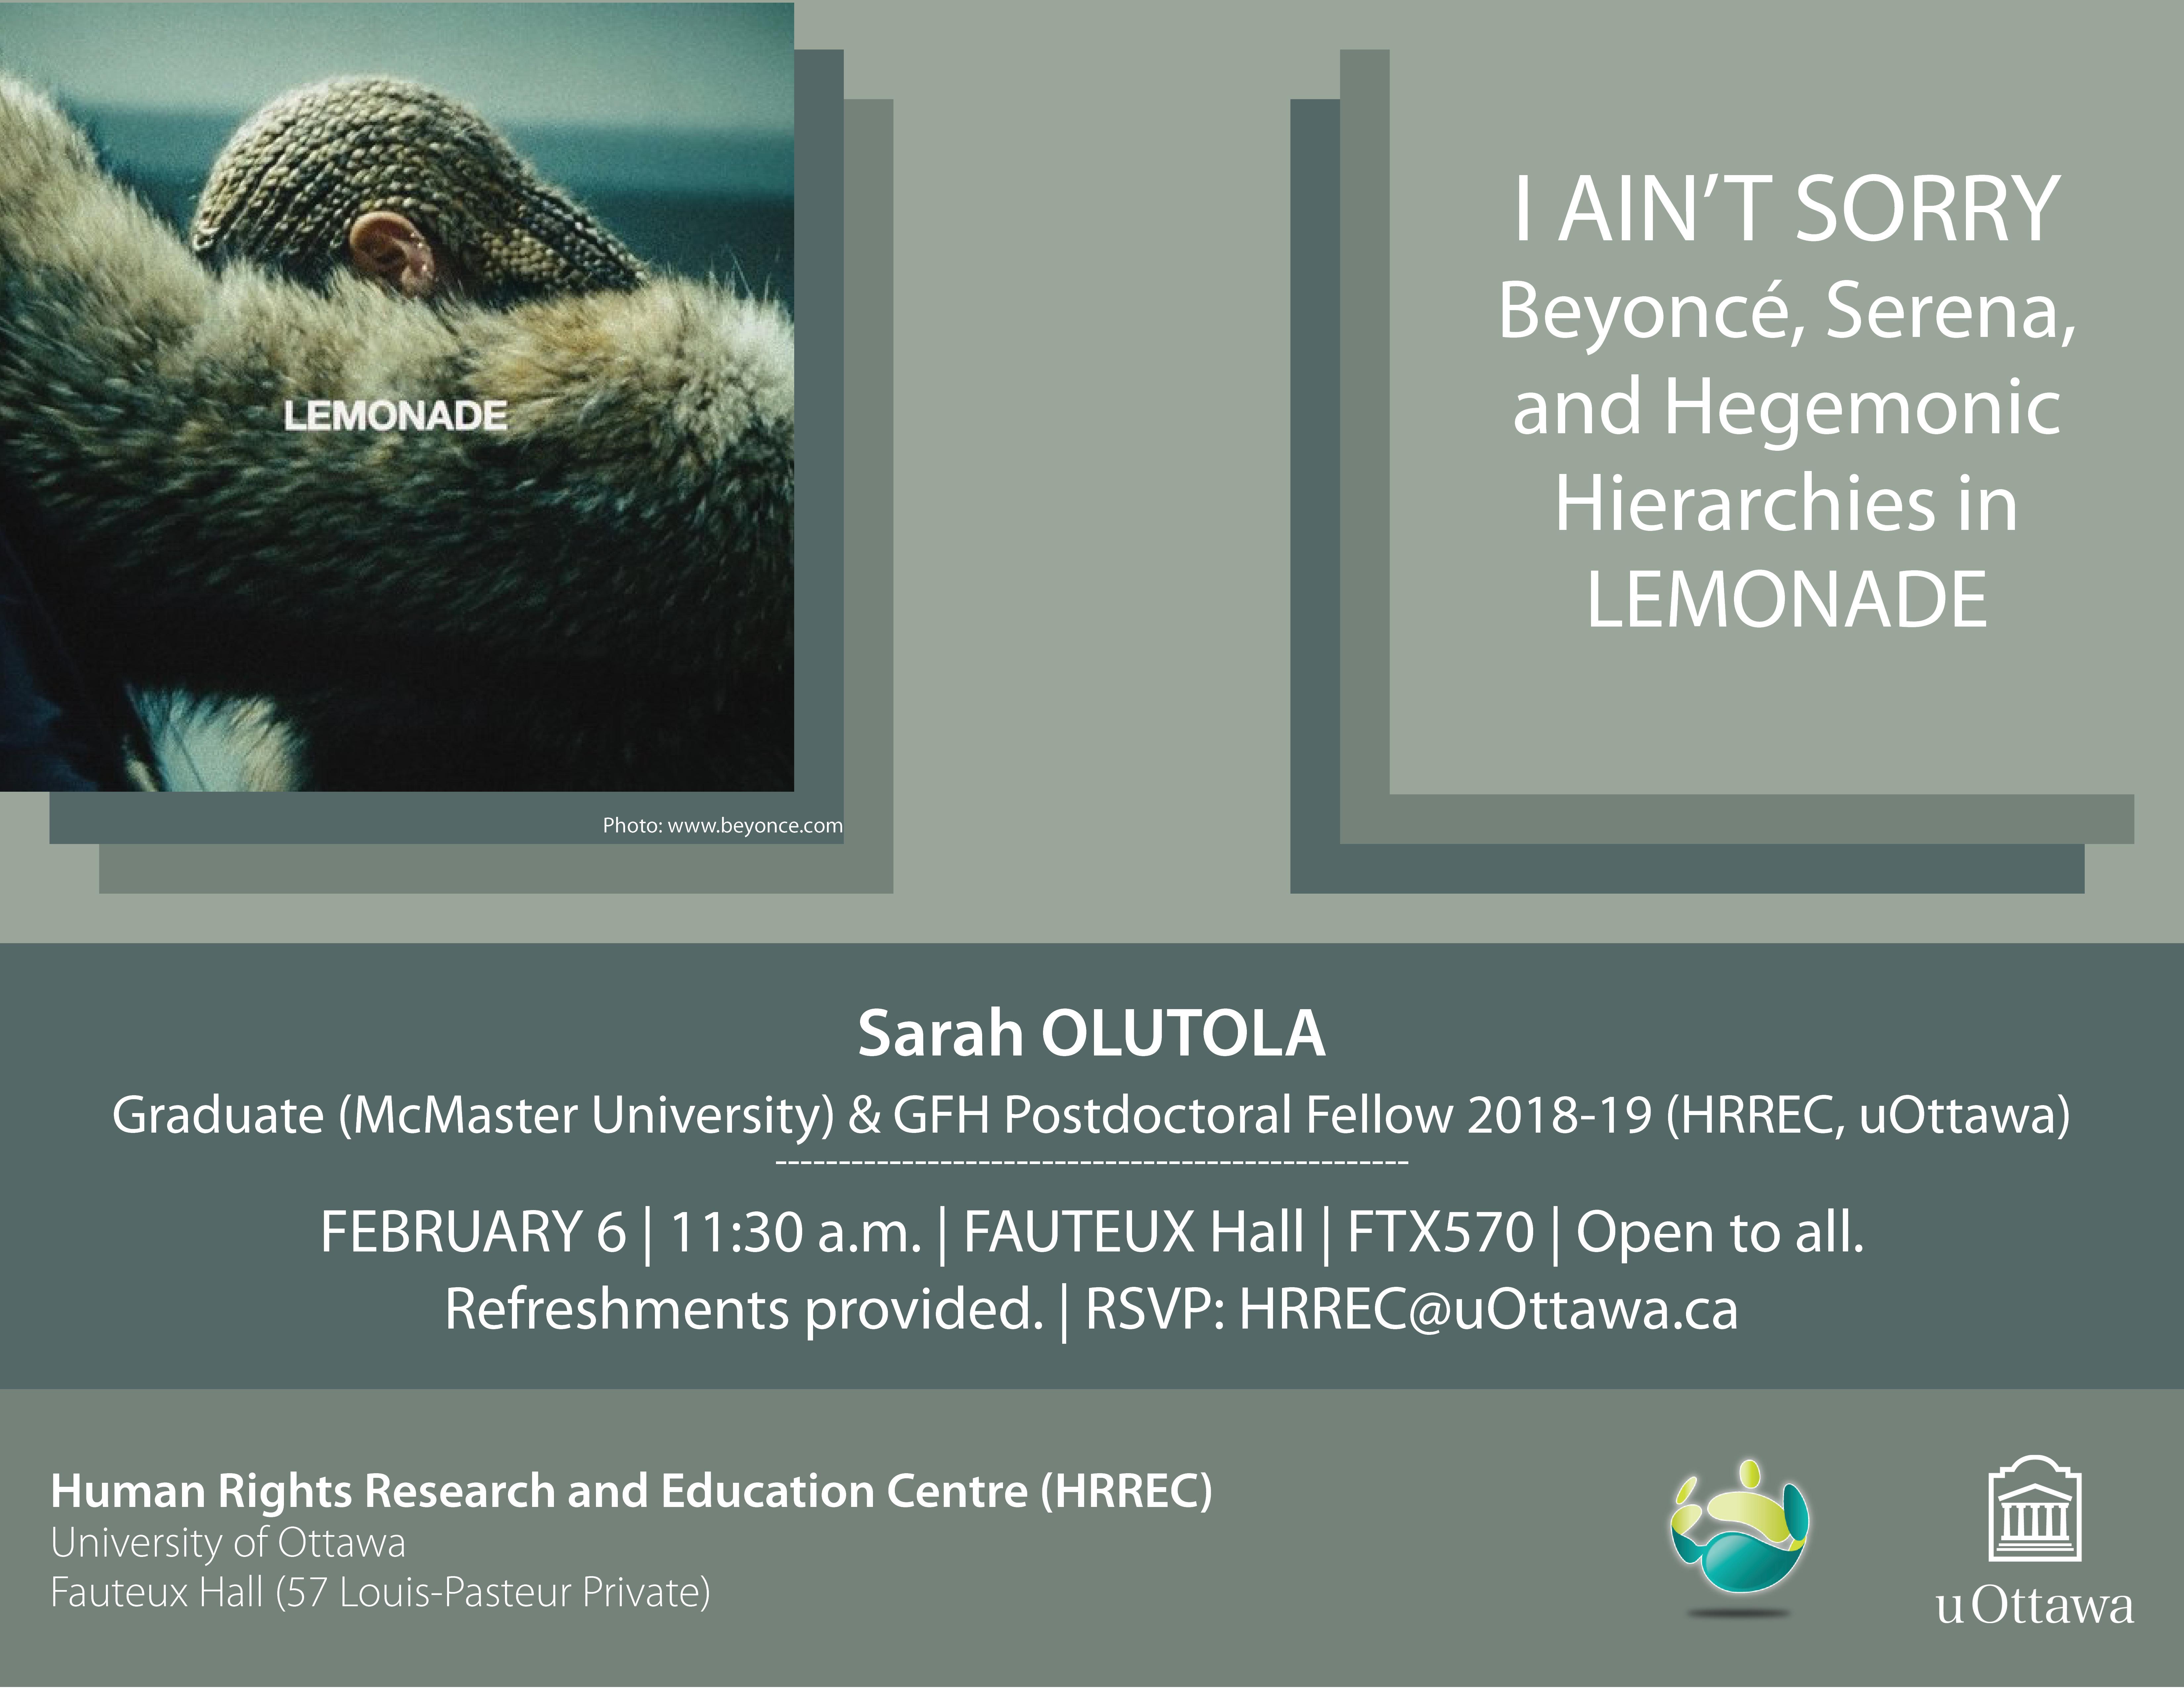 Presentation by Sarah Olutola